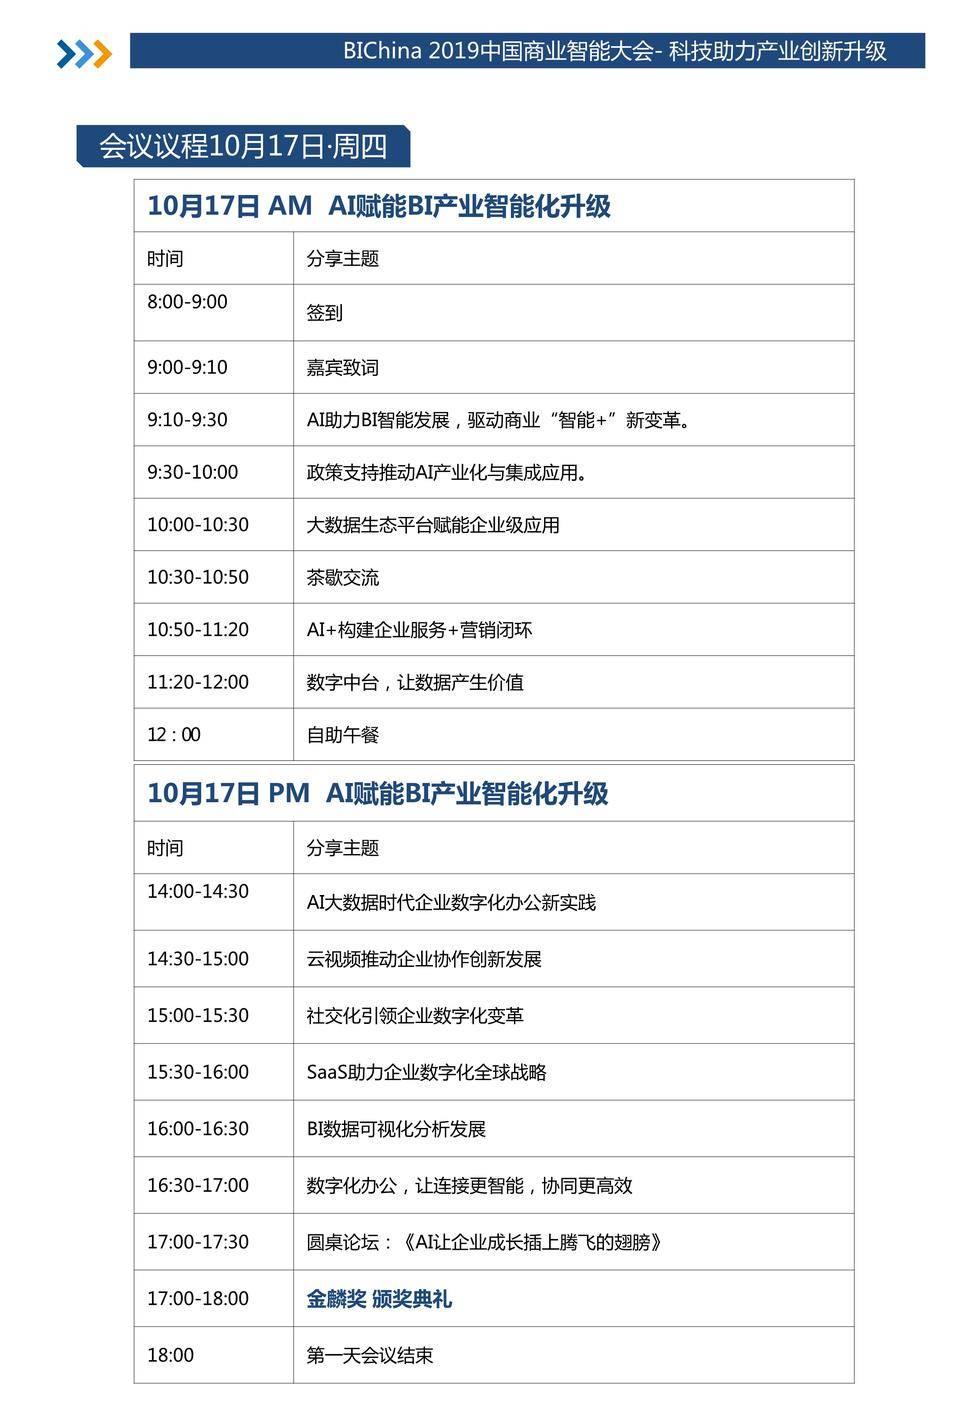 BIChina2019中国商业智能创新大会_6.jpg